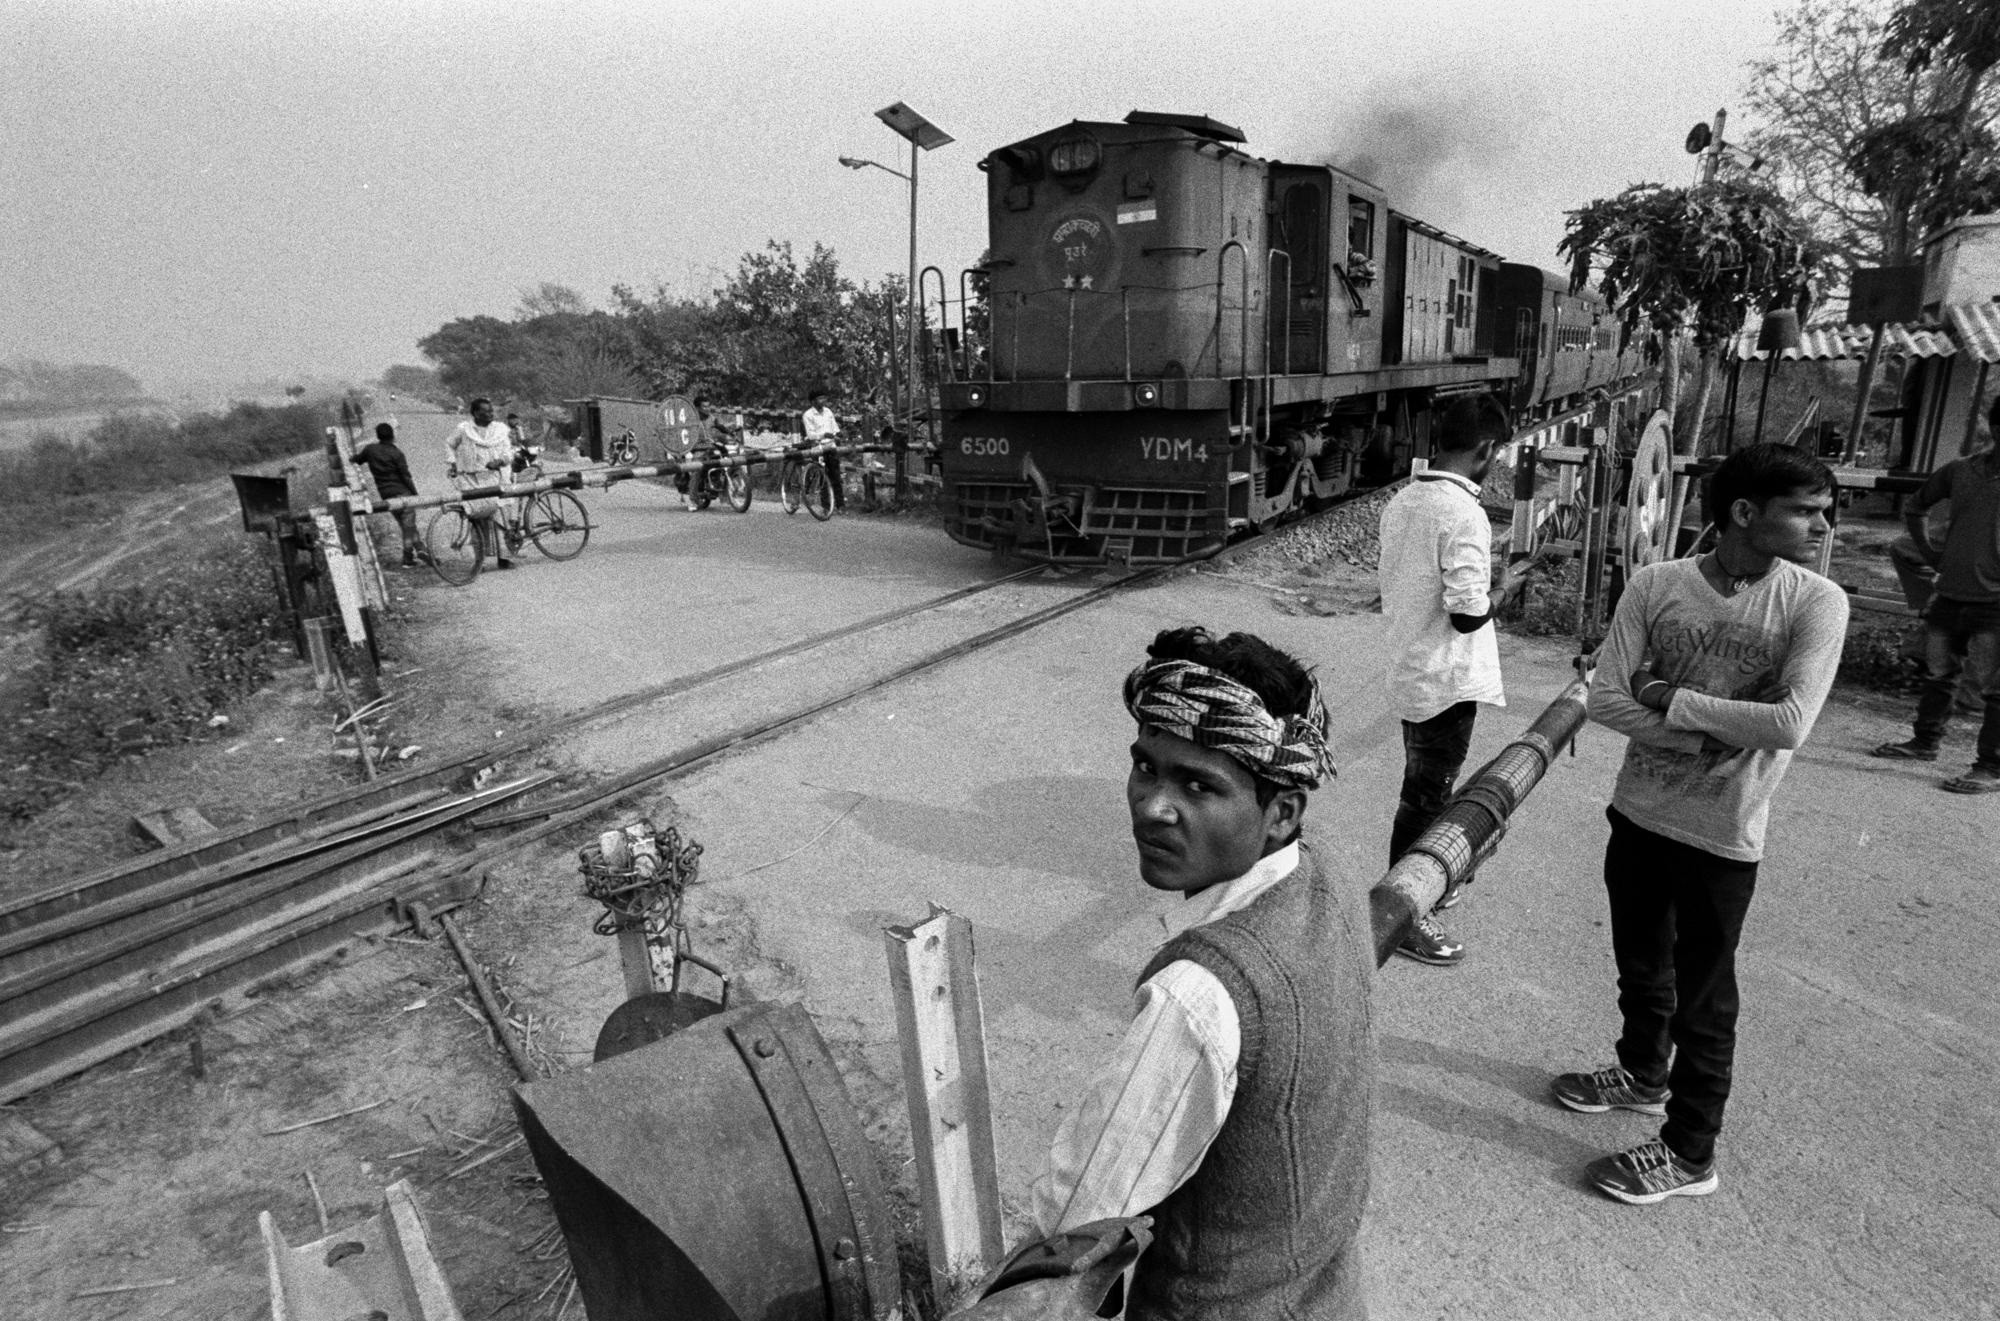 Crowd around train crossing (Pic: Nandakumar Narasimhan)